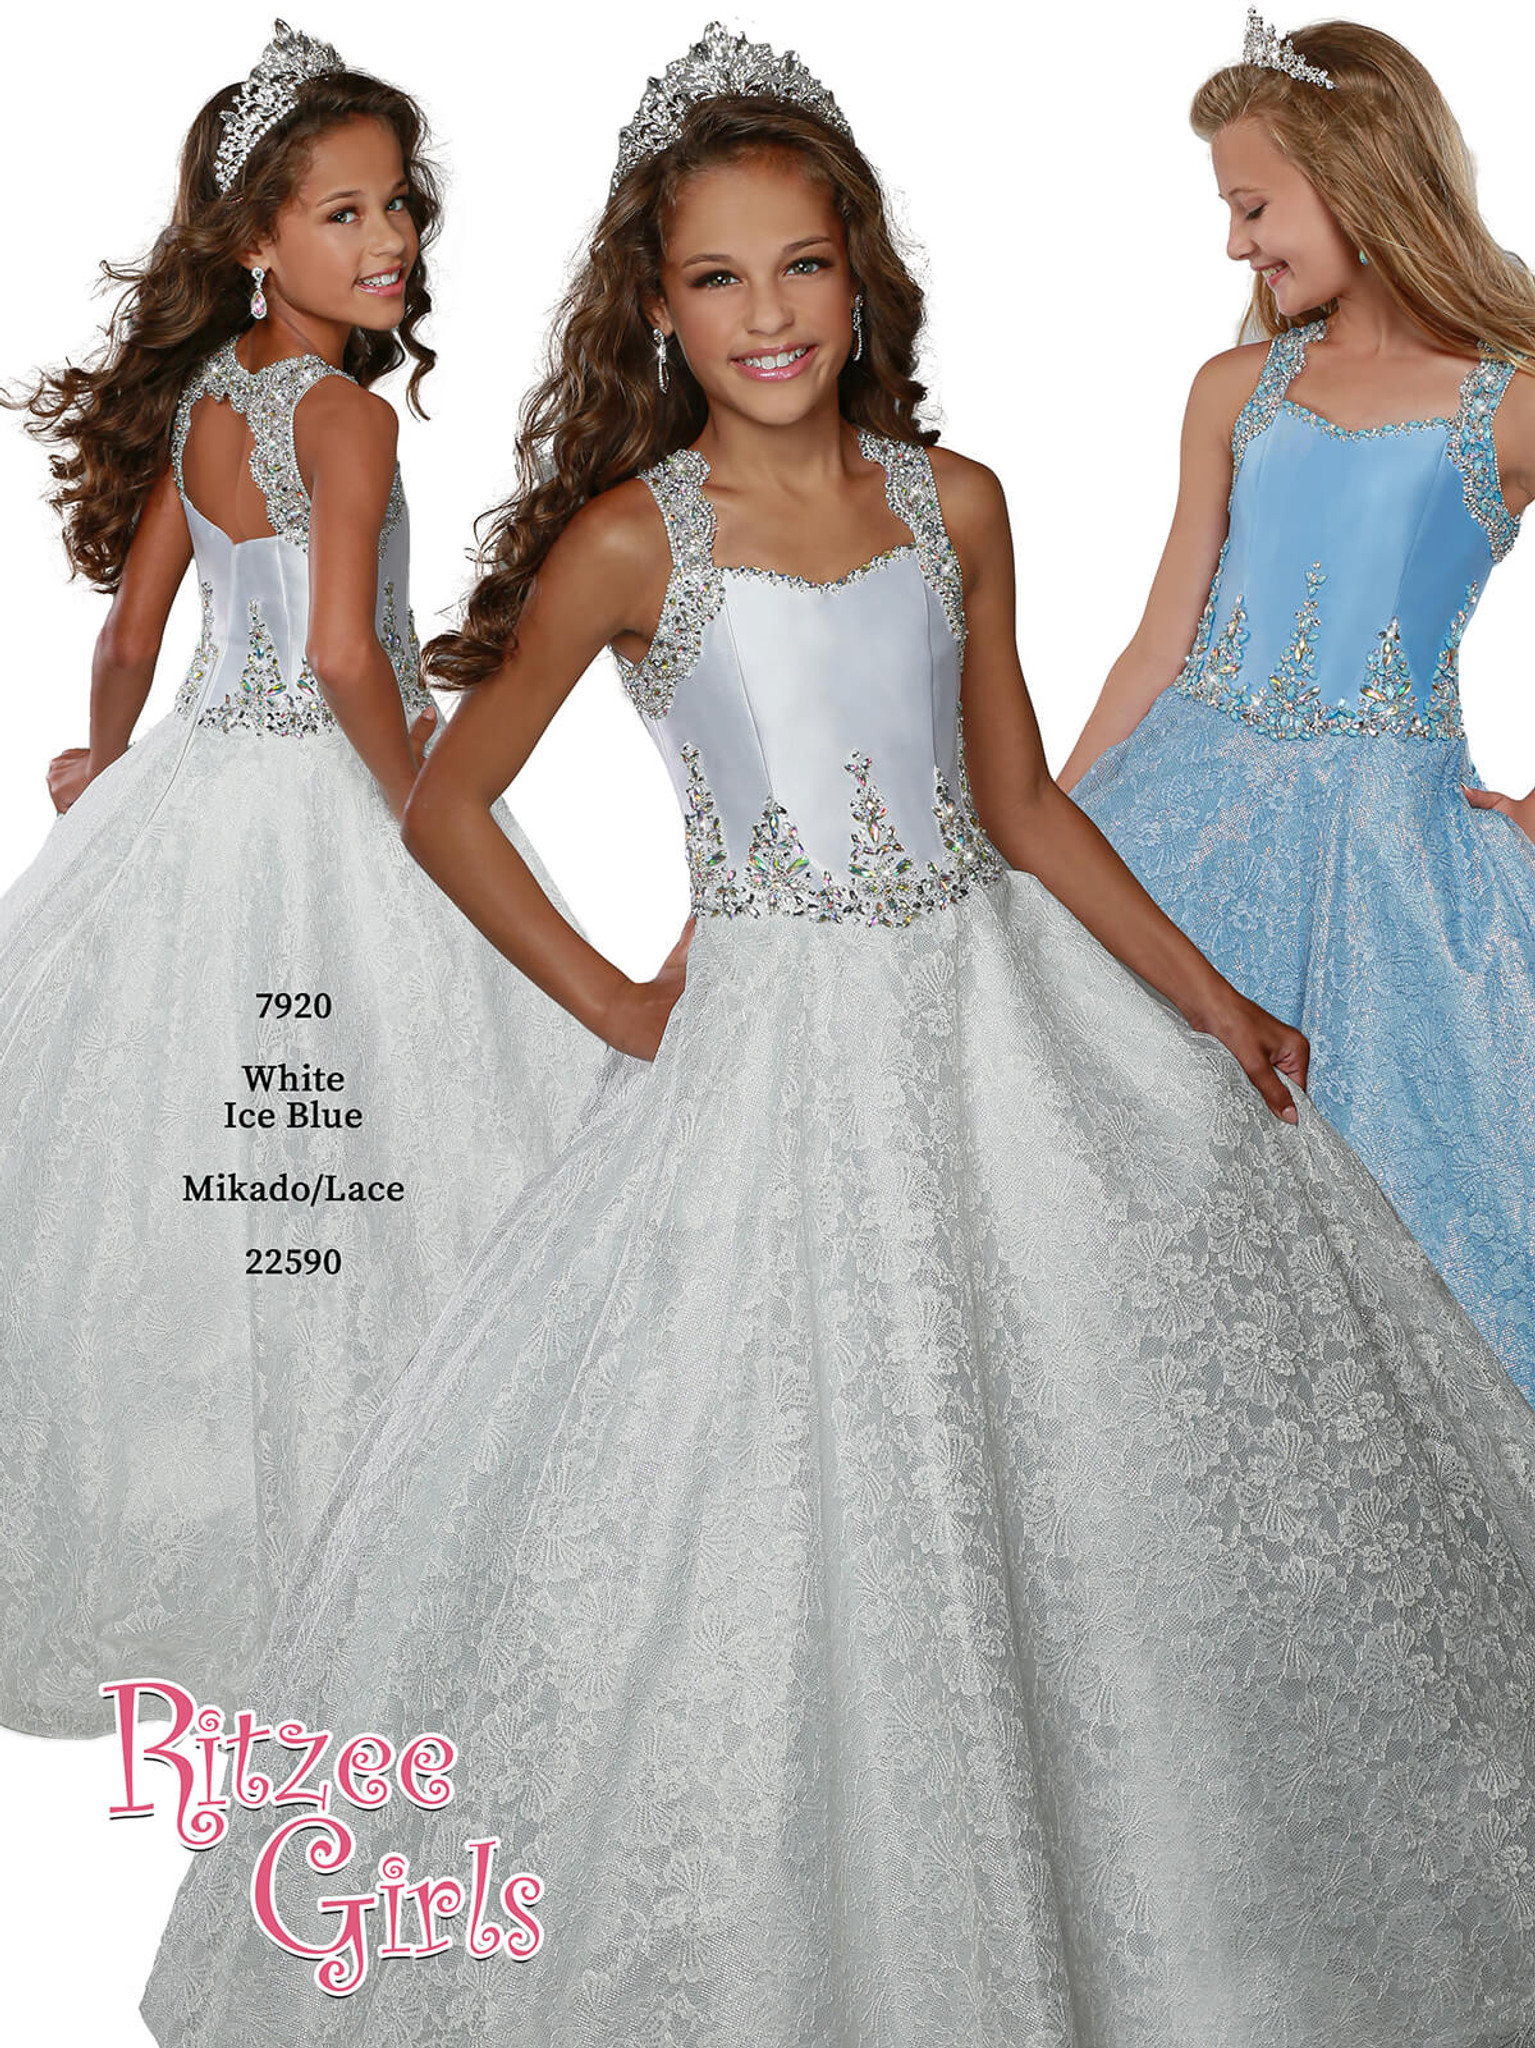 Ball Gown Ritzee Girls 7920 Pageant Dress PageantDesigns